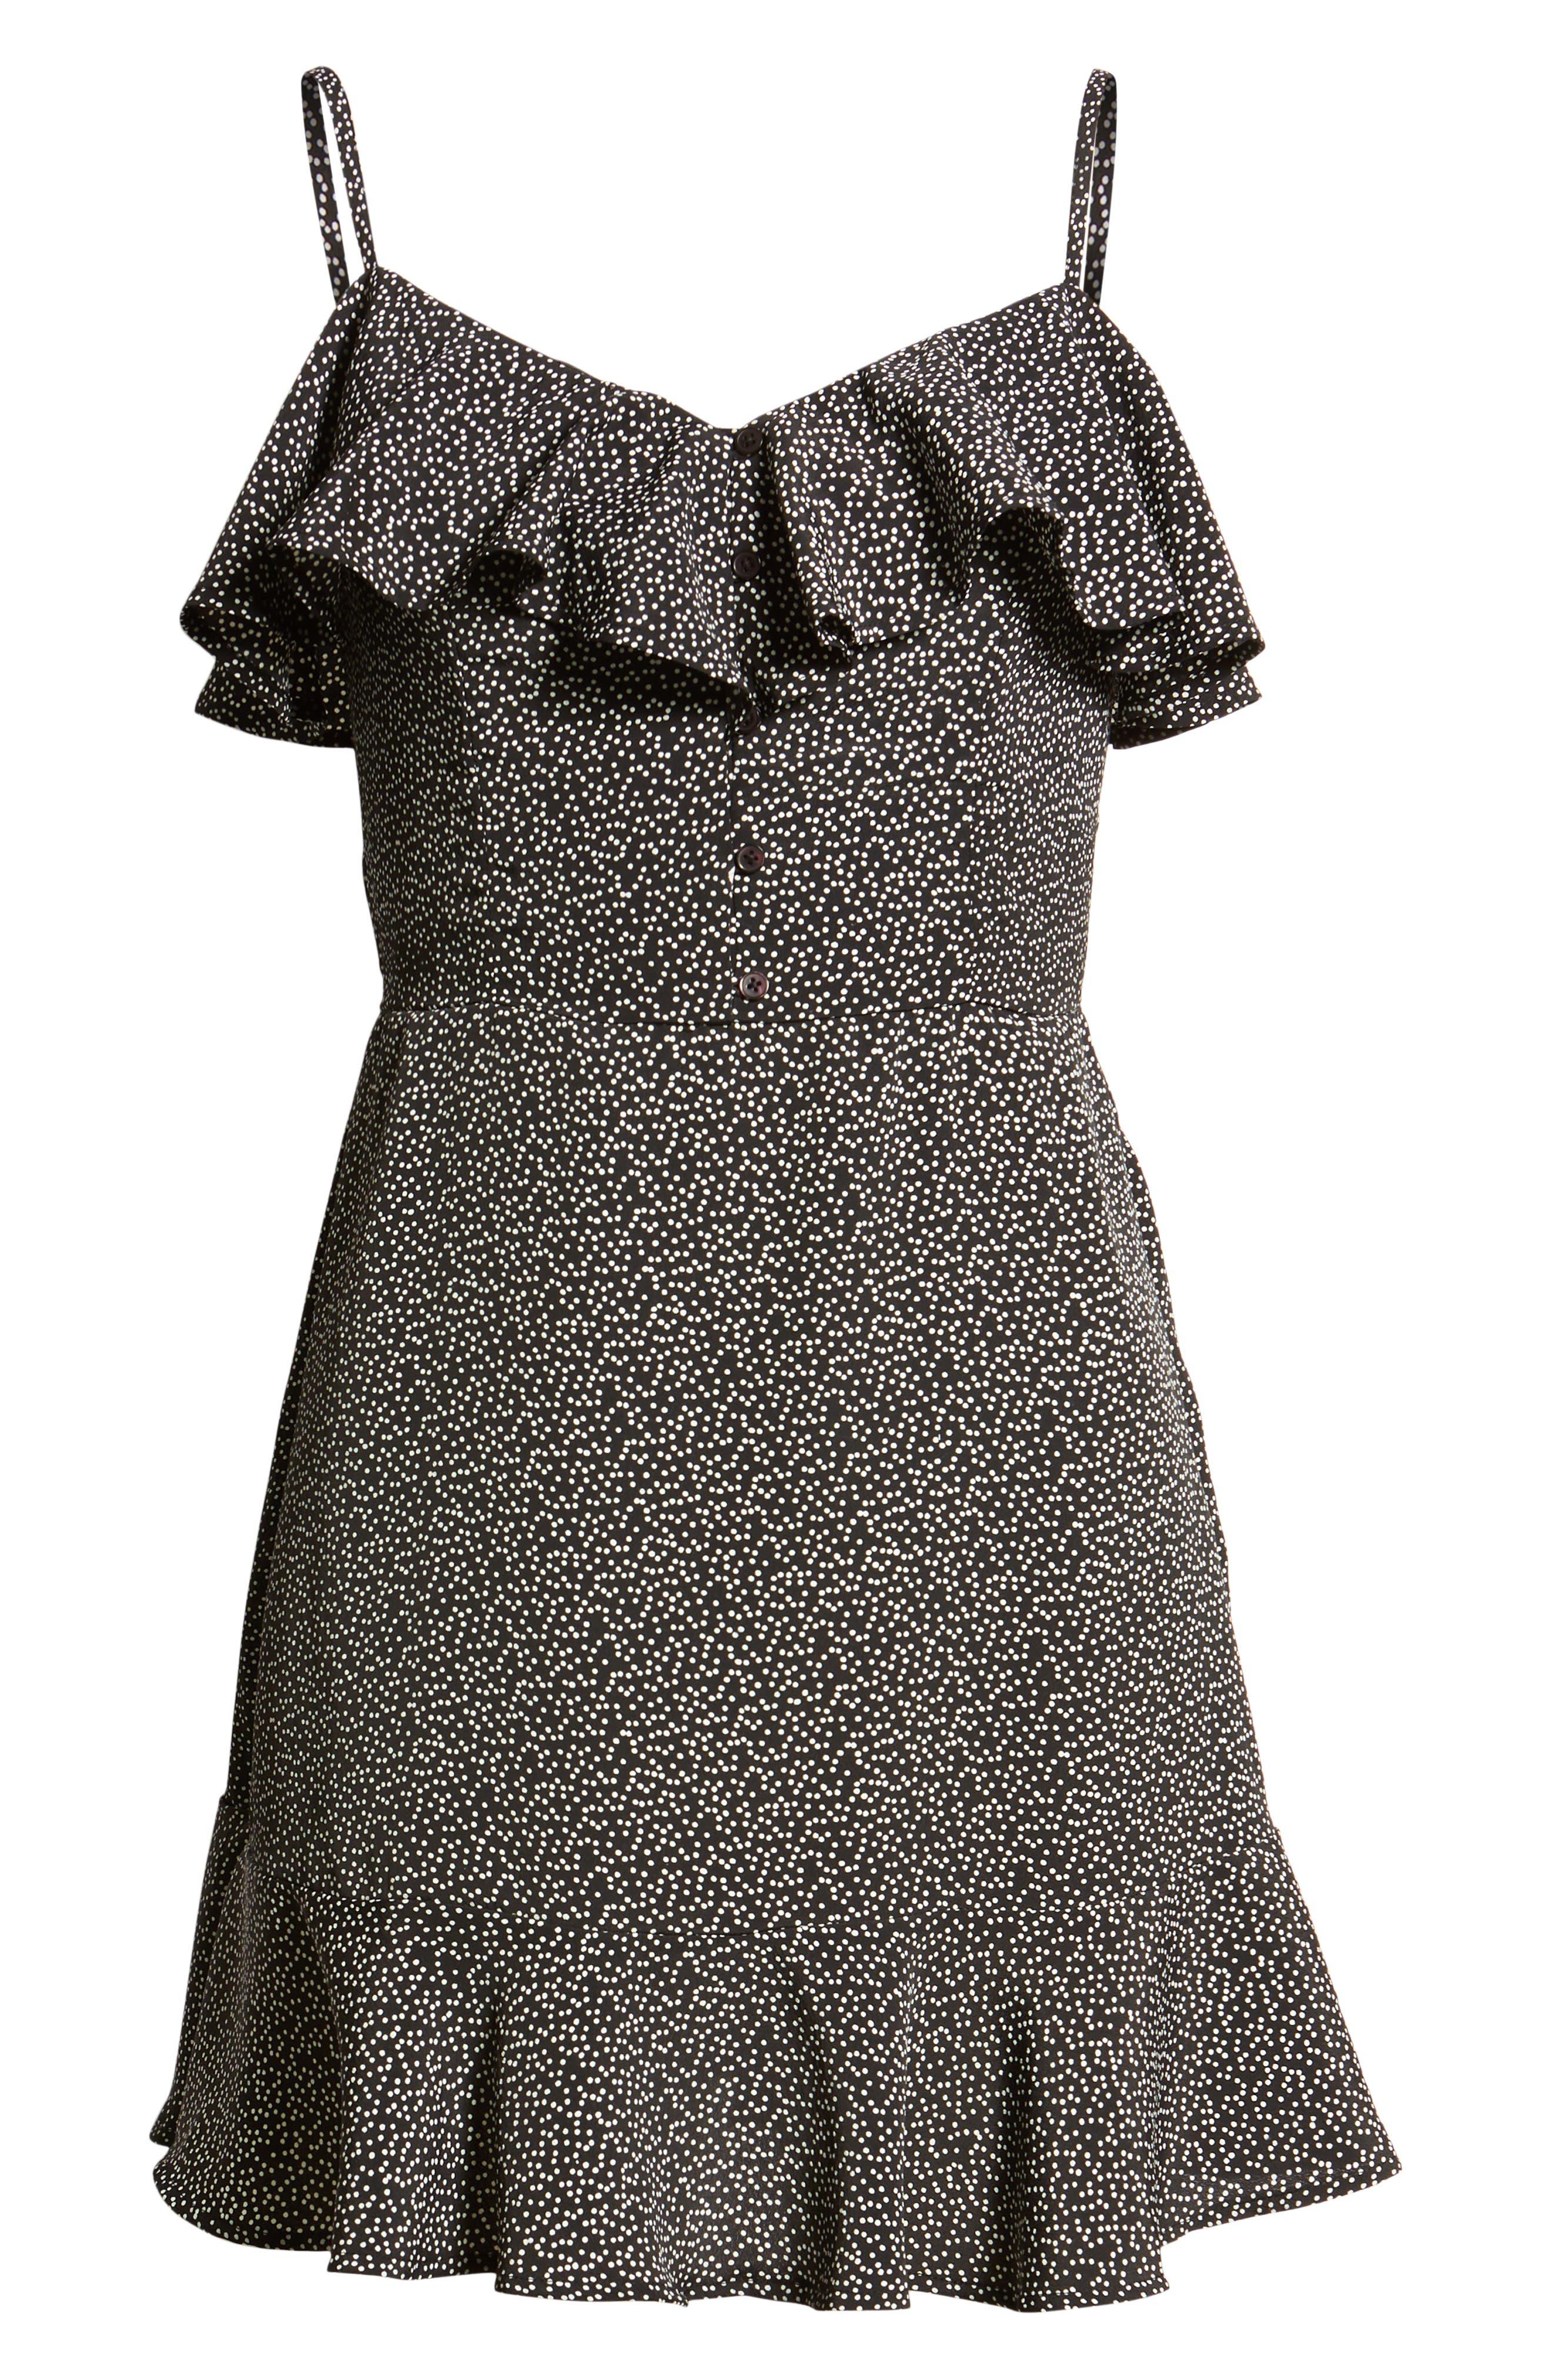 Button Front Frilly Dot Dress,                             Alternate thumbnail 7, color,                             Black Ground Polka Dot